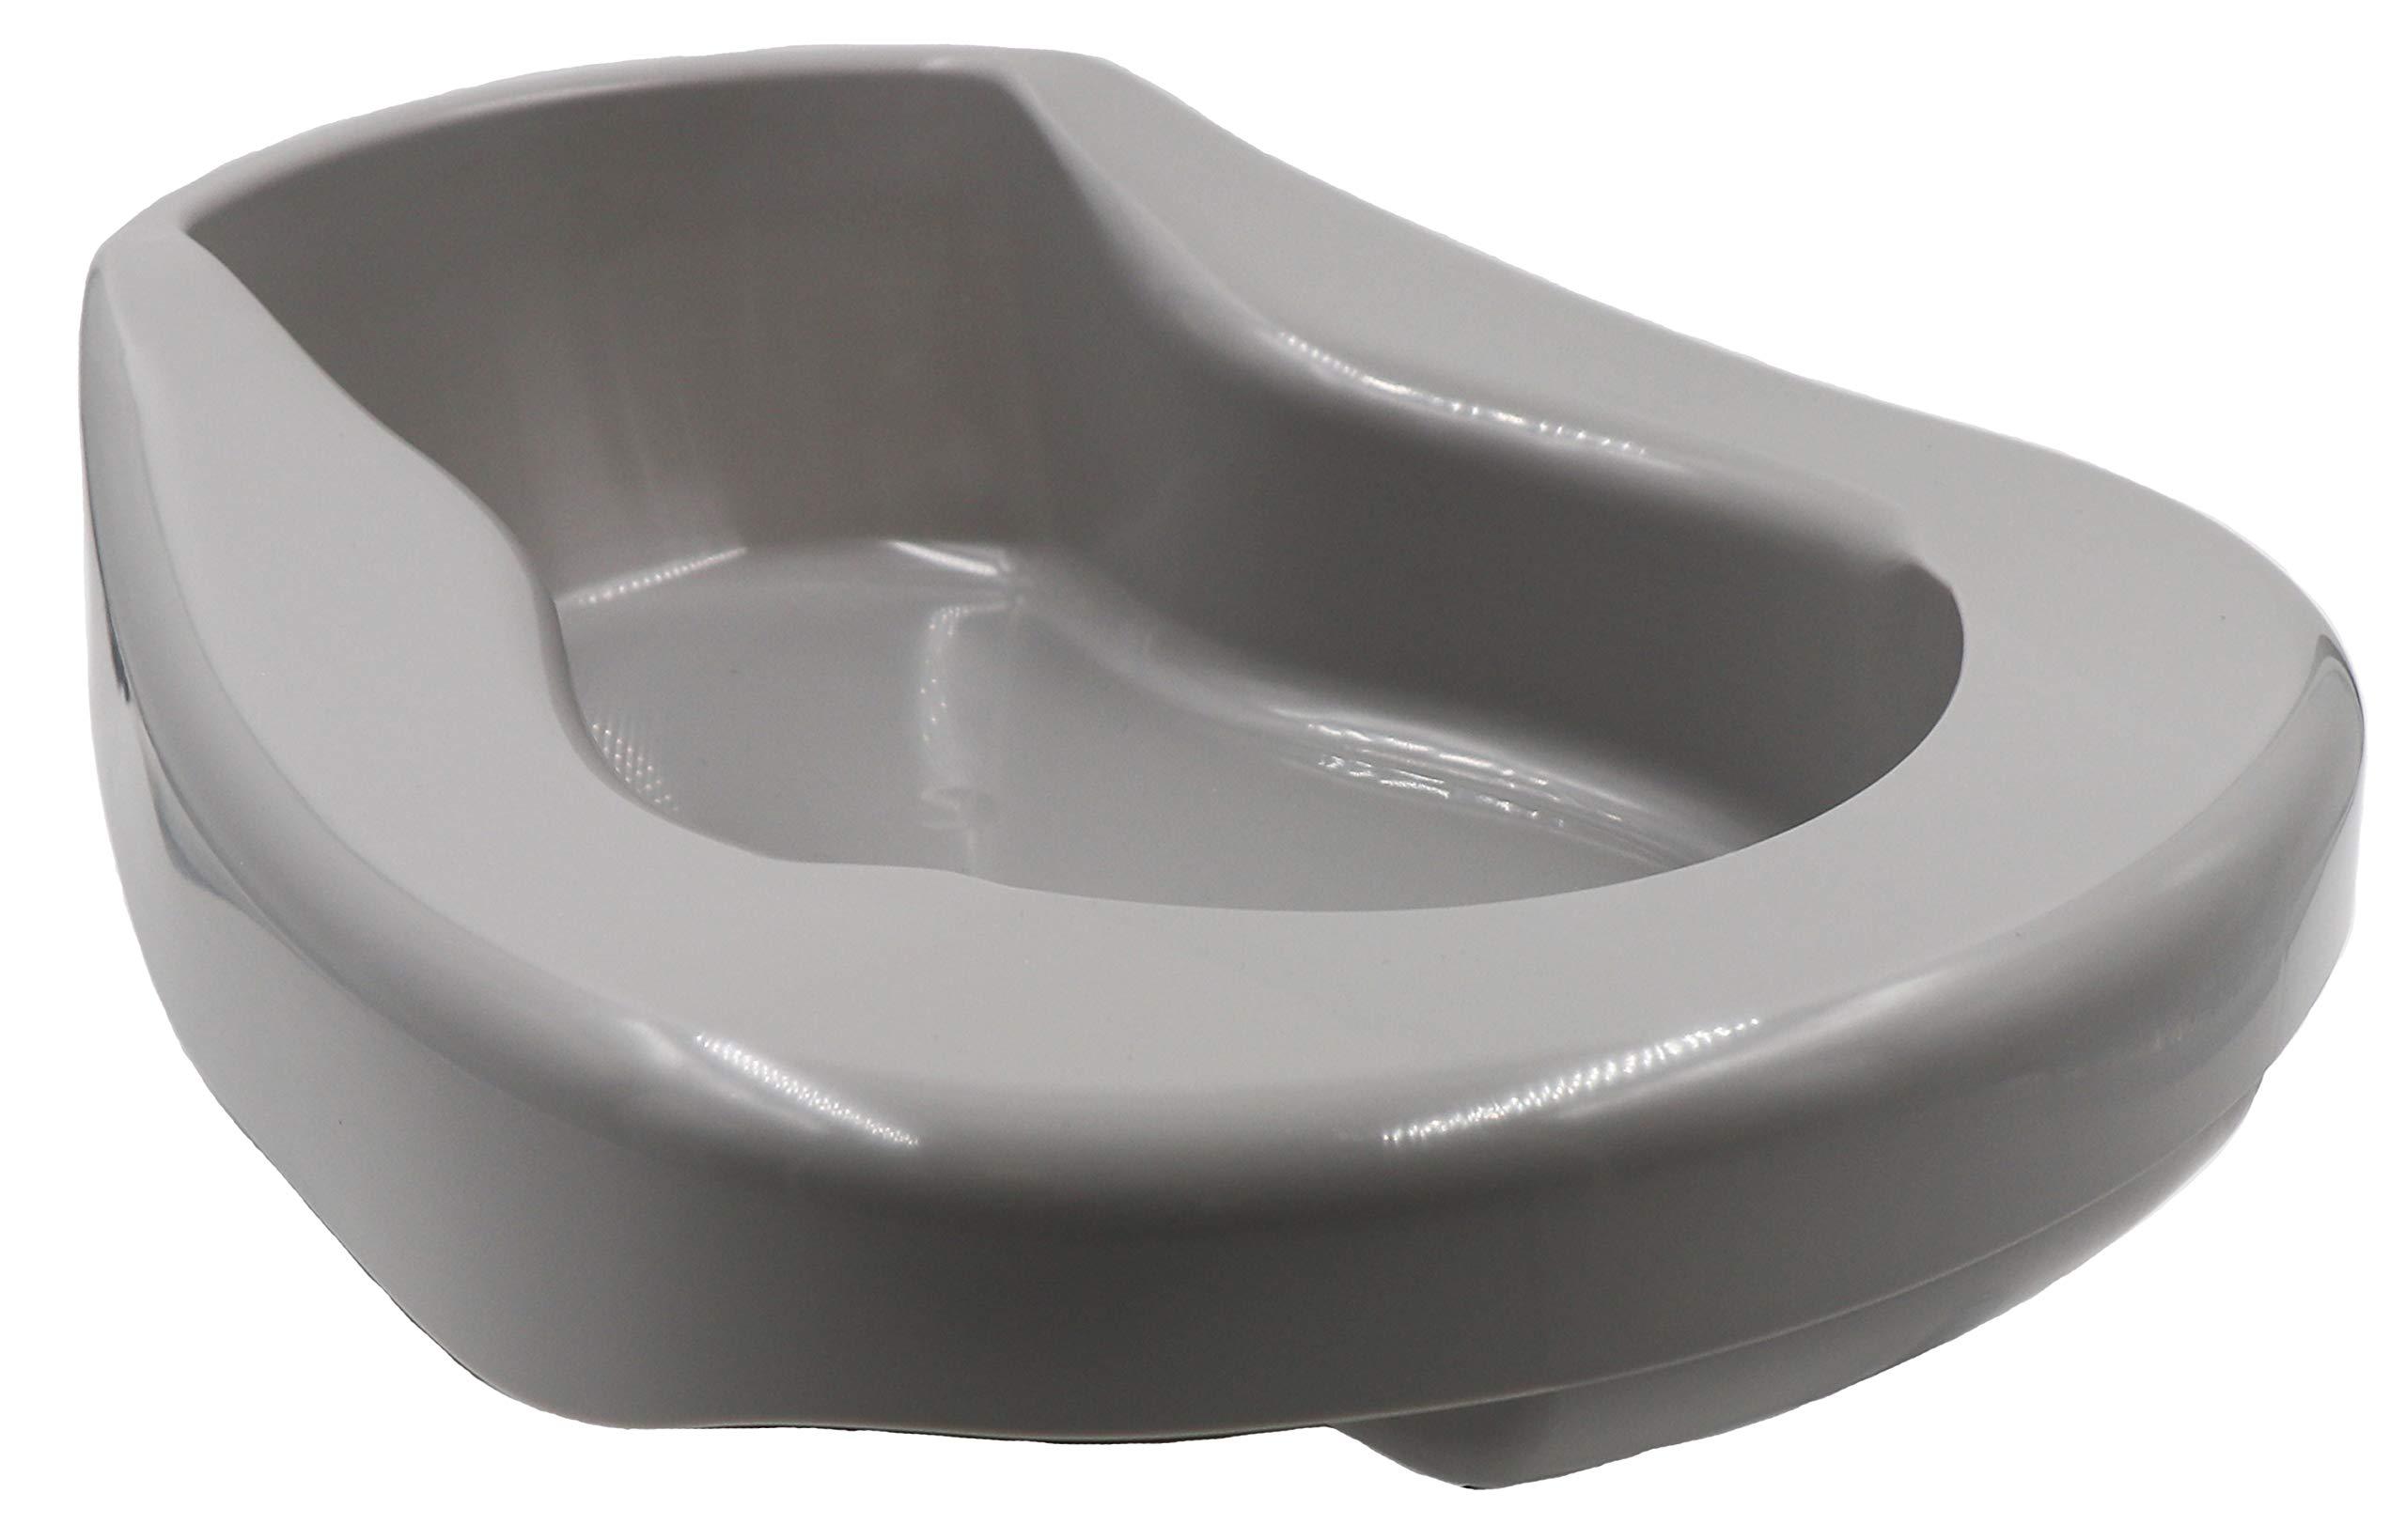 Healthstar Pontoon Bedpan, 2 Quart, Gray